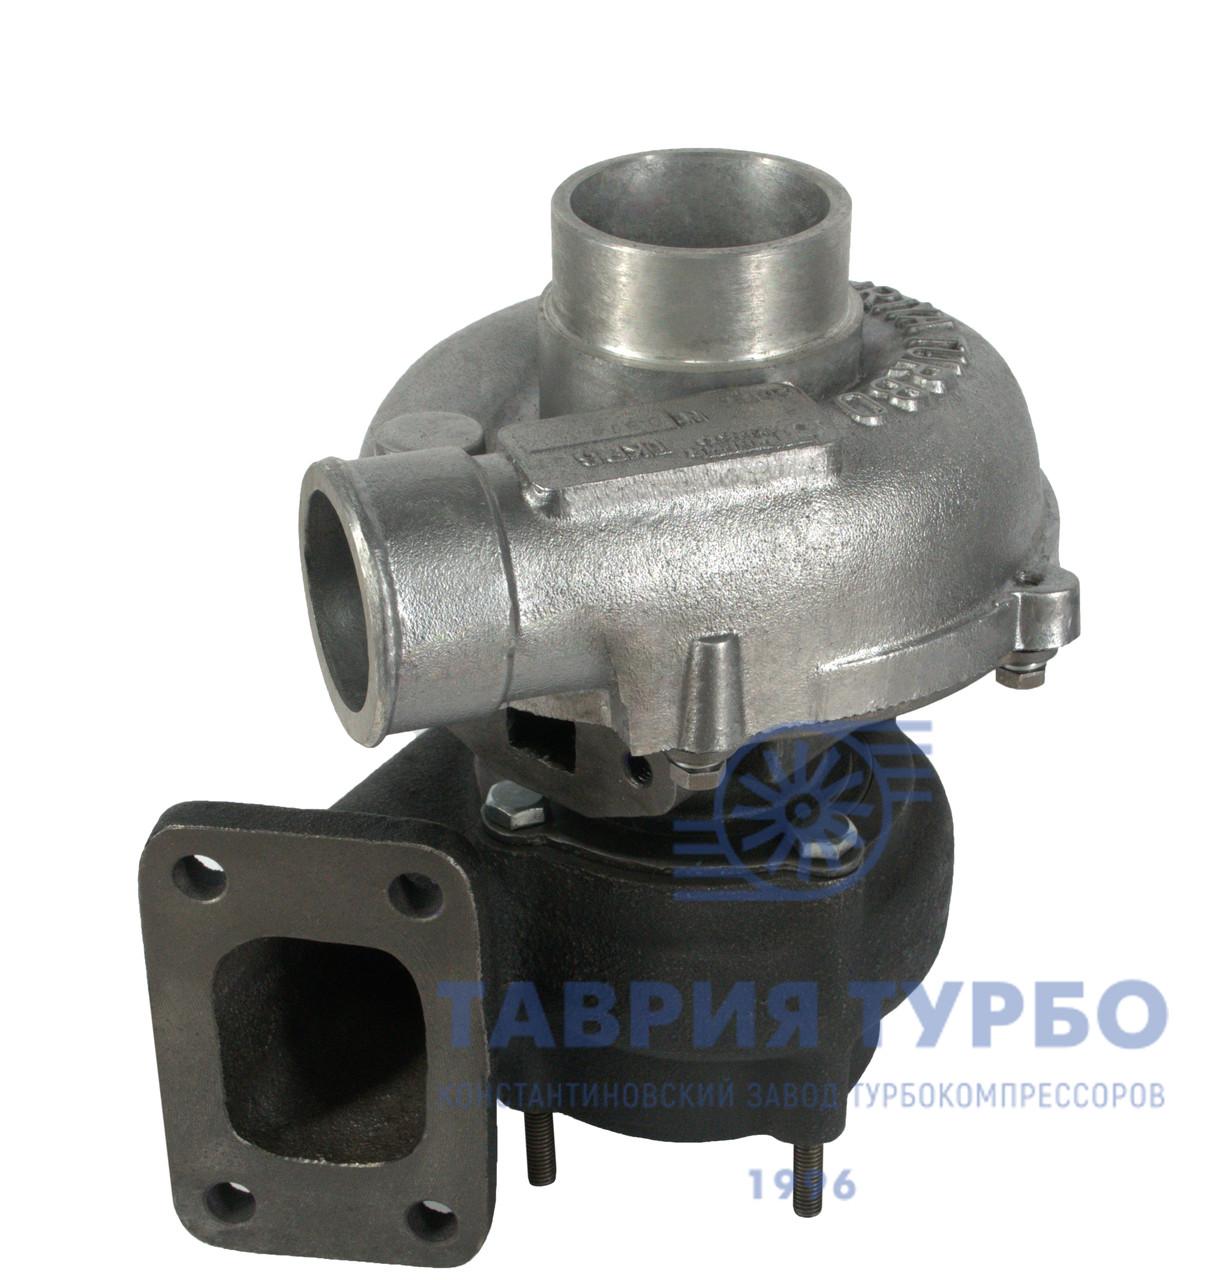 Турбокомпрессор ТКР 6-10.1 , Турбина на Тракторы МТЗ-890,-892, АМКОДОР; Двигатель Д-245.5S2, Д-245.43S2